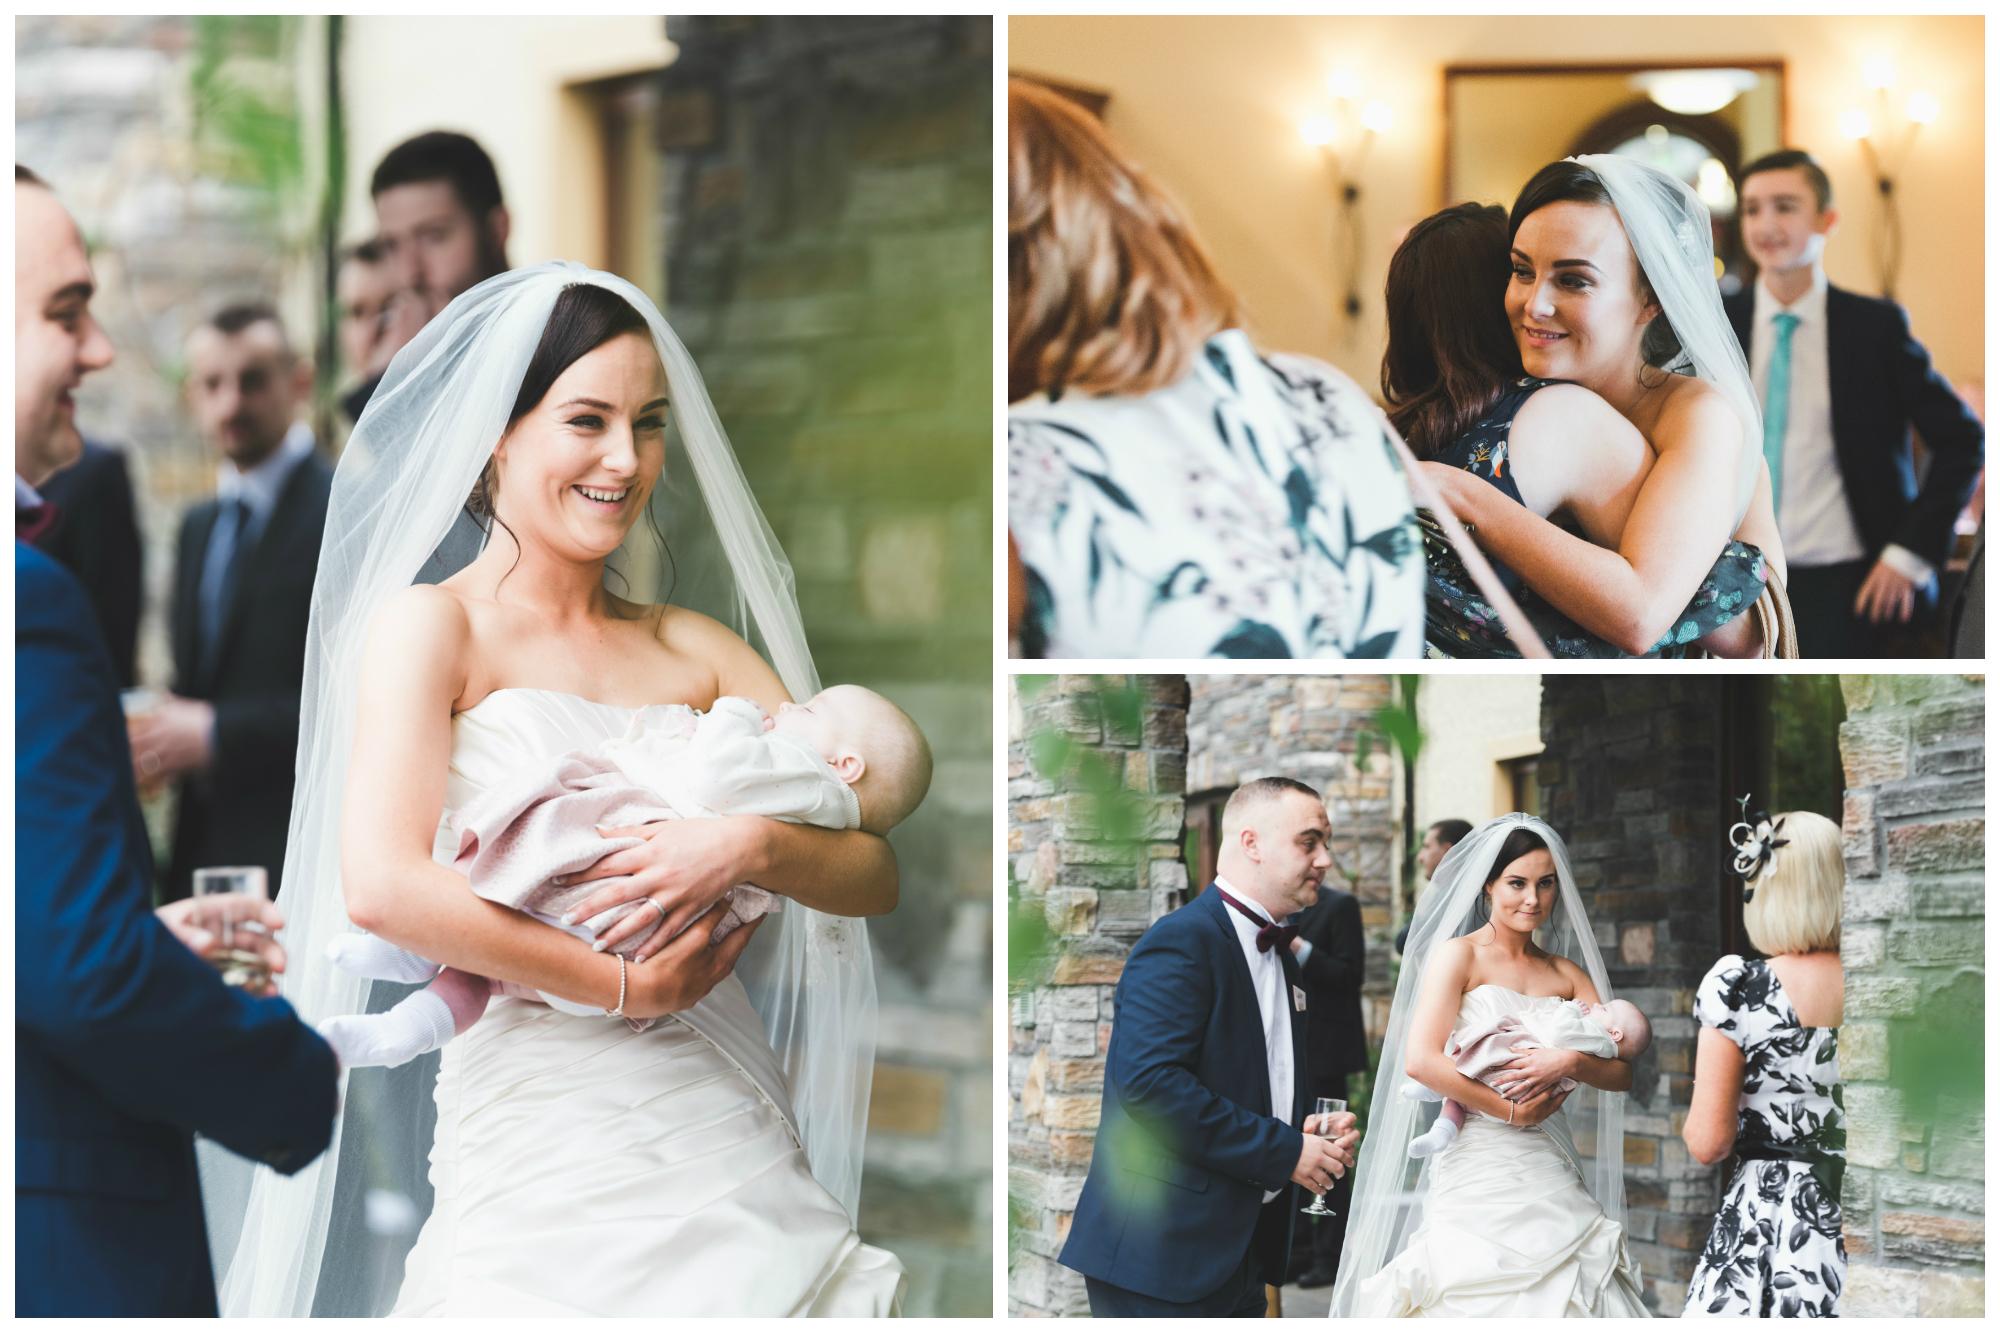 Northern_Ireland_Wedding_Photographer_Purephotoni_Dunsilly_Hotel_Outside.jpg